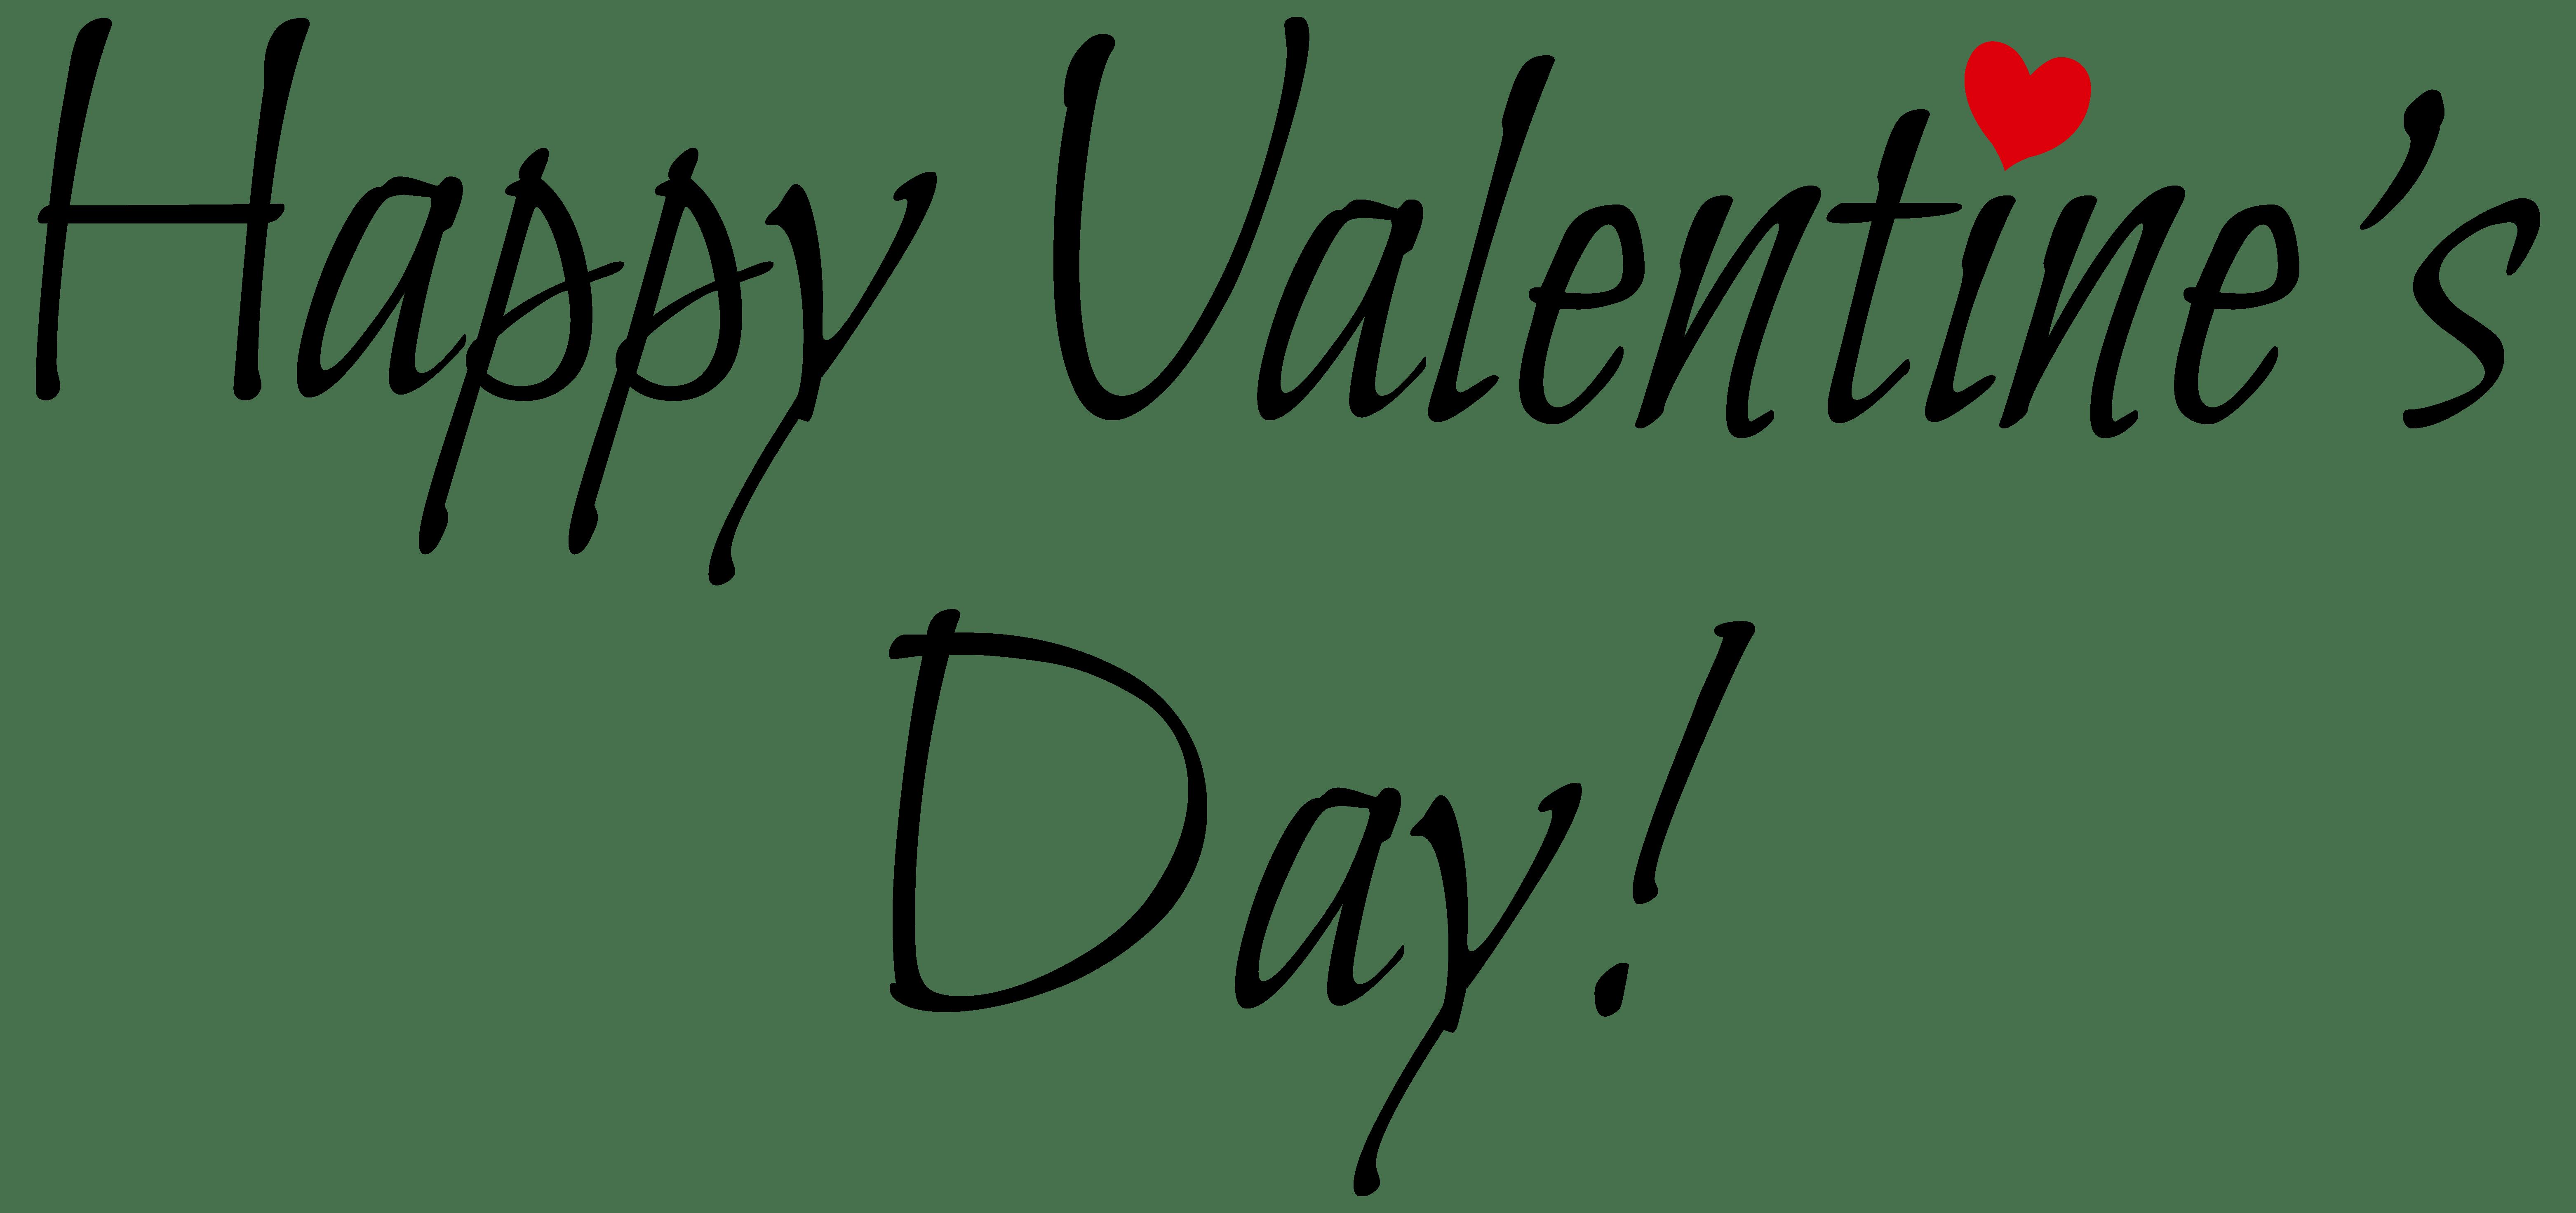 Happy valentines valentine s. Day clipart black and white